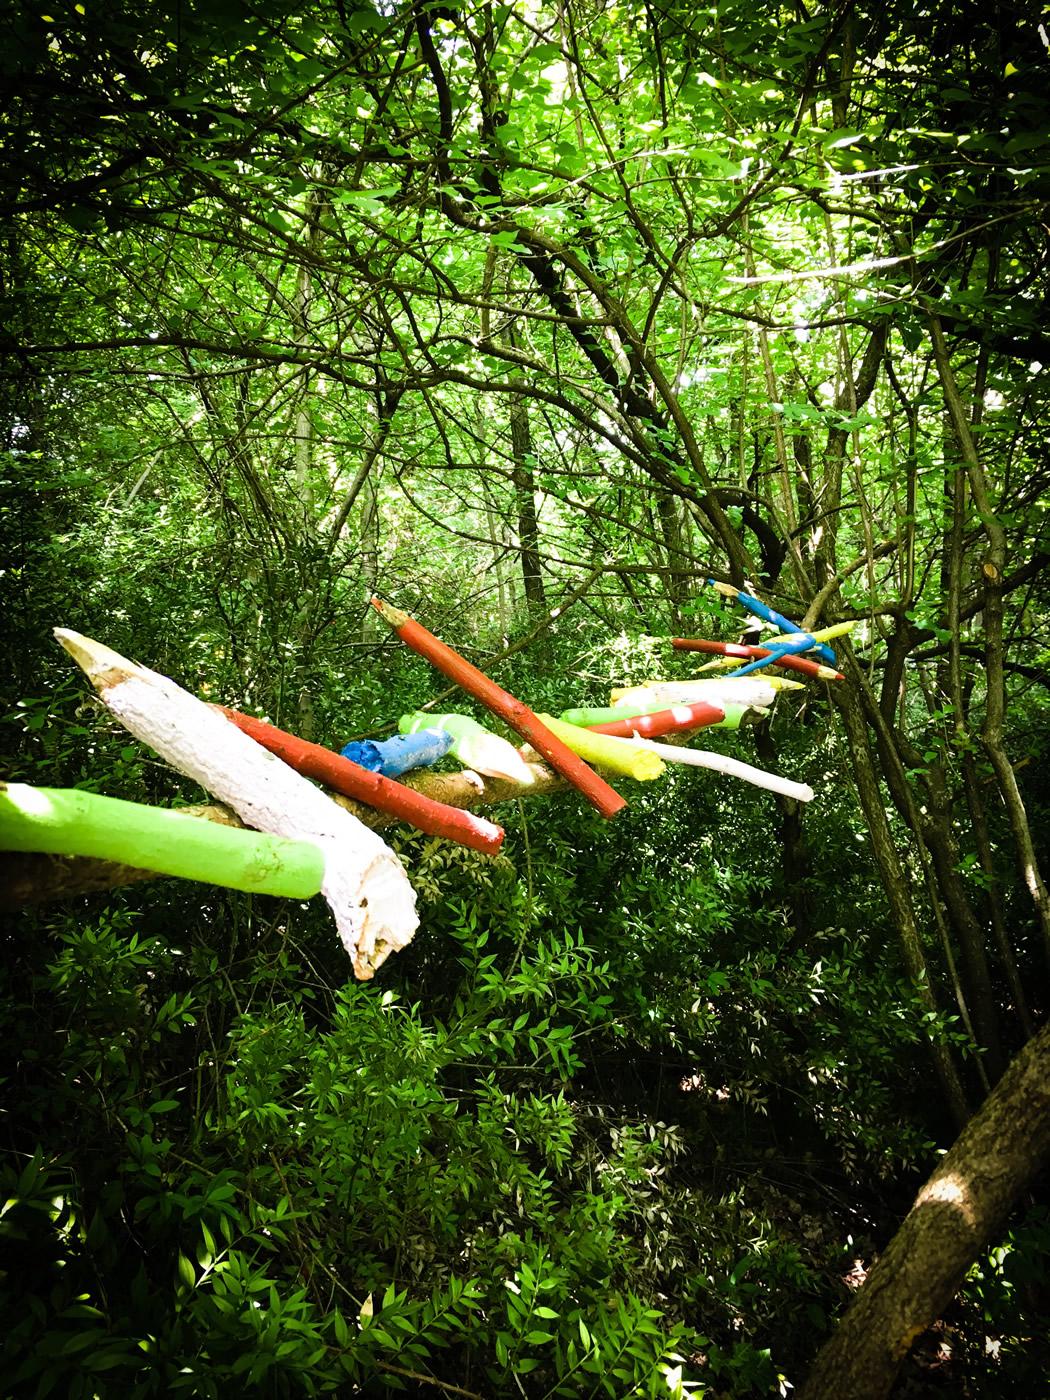 bosco delle meraviglie torino bnb 83 - 1